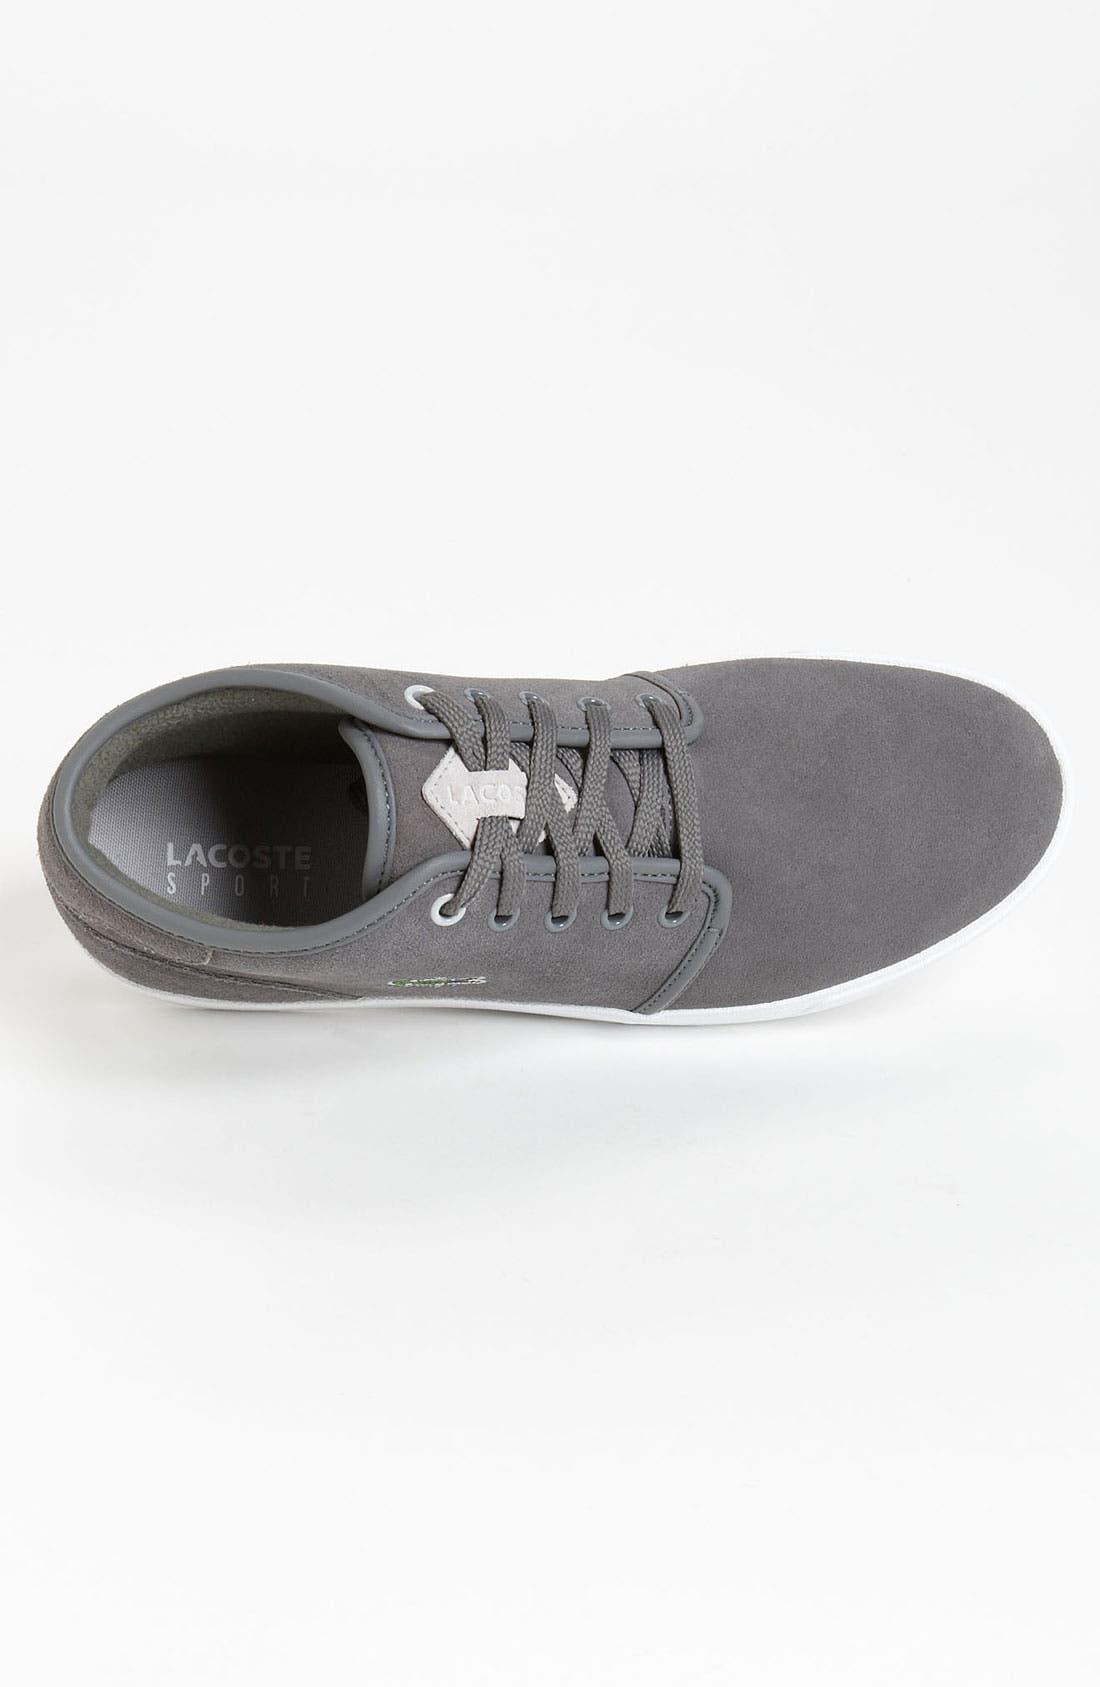 Alternate Image 3  - Lacoste 'Benoit CIW' Sneaker